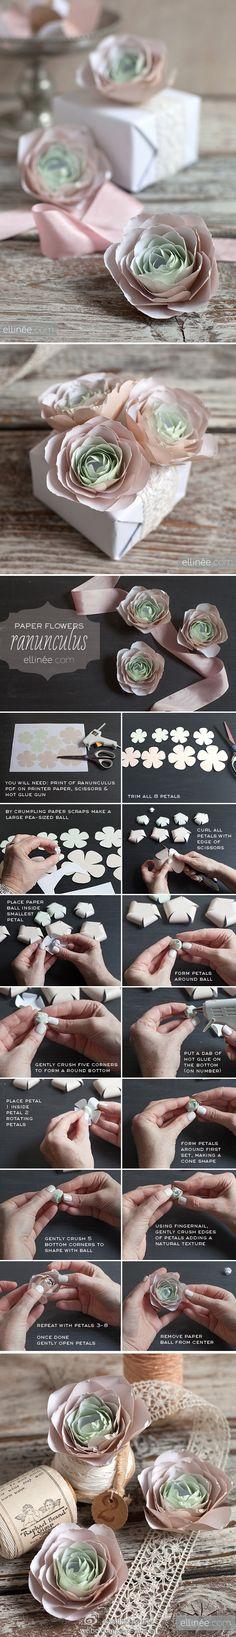 DIY礼品包装纸花教程